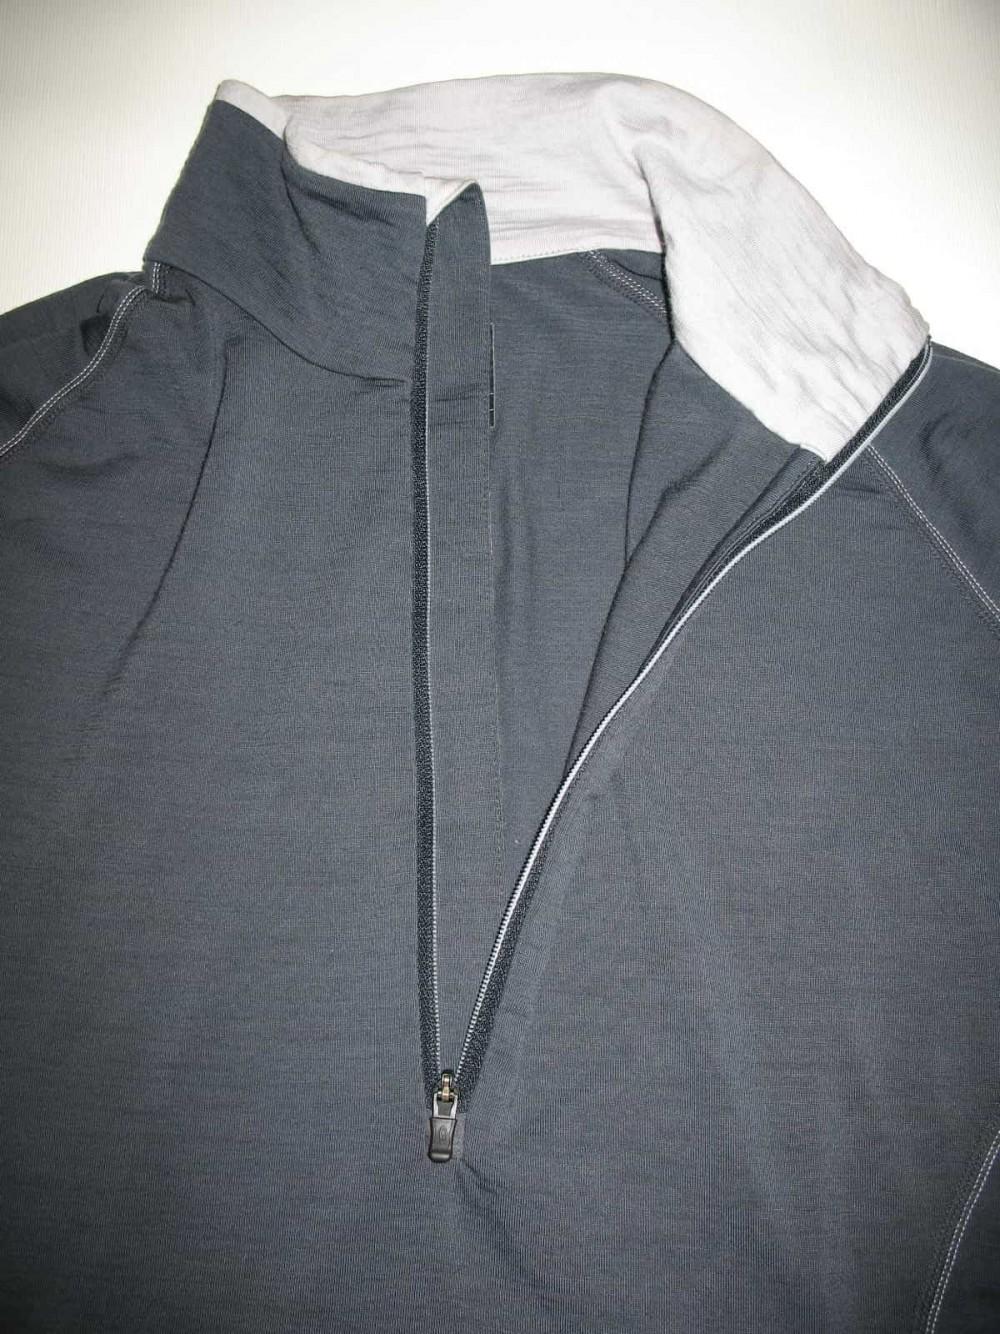 Термобелье ICEBREAKER GT 200 jersey lady (размер M/мужской S) - 2